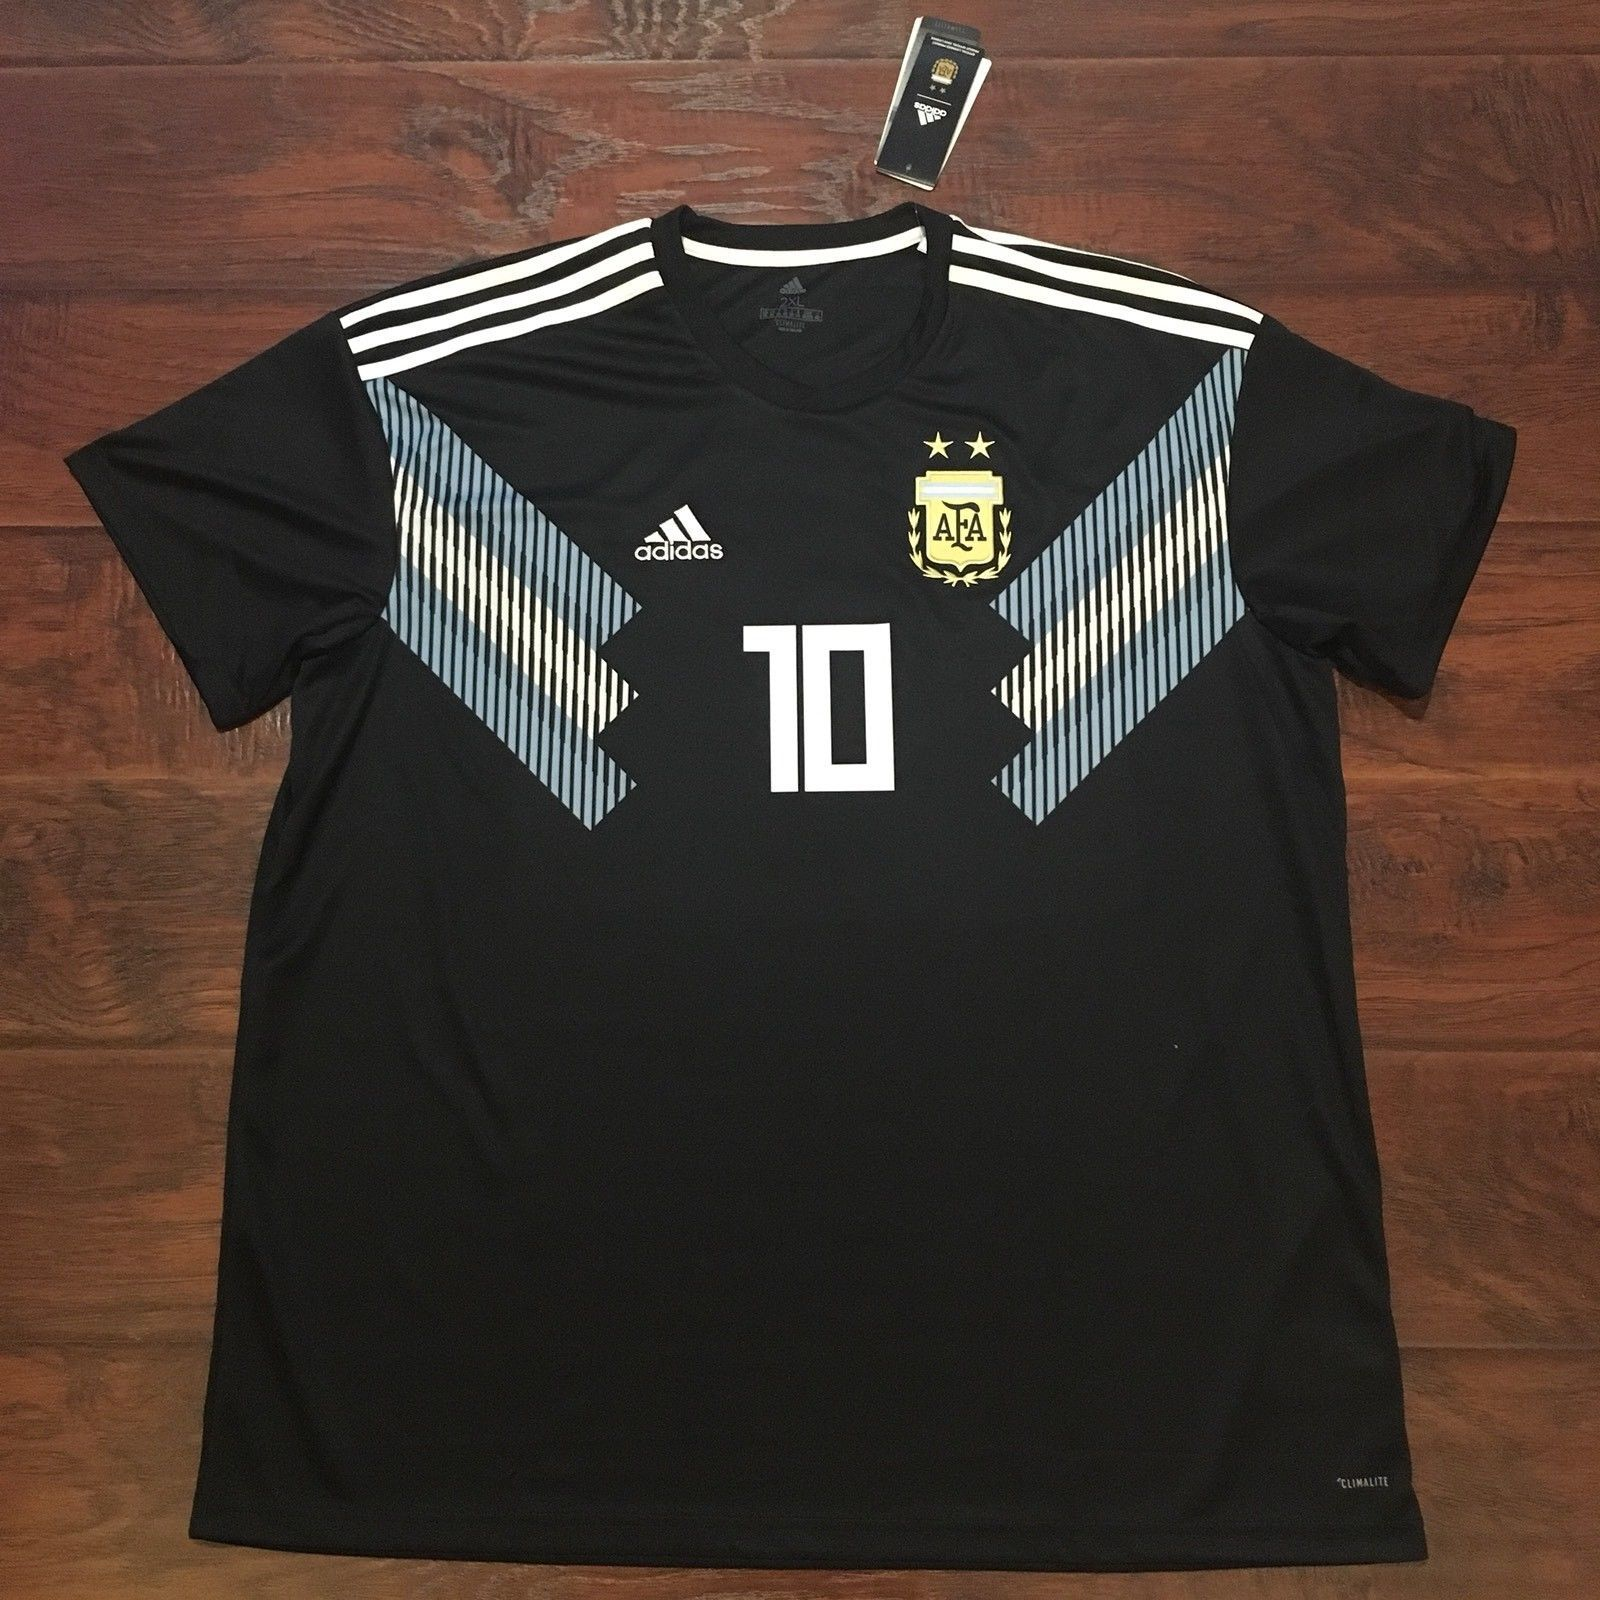 2018 Argentina Away Jersey 10 Messi Xl Adidas World Cup Soccer Fashion Big Size T Shirt 2xl Football New Discount Price